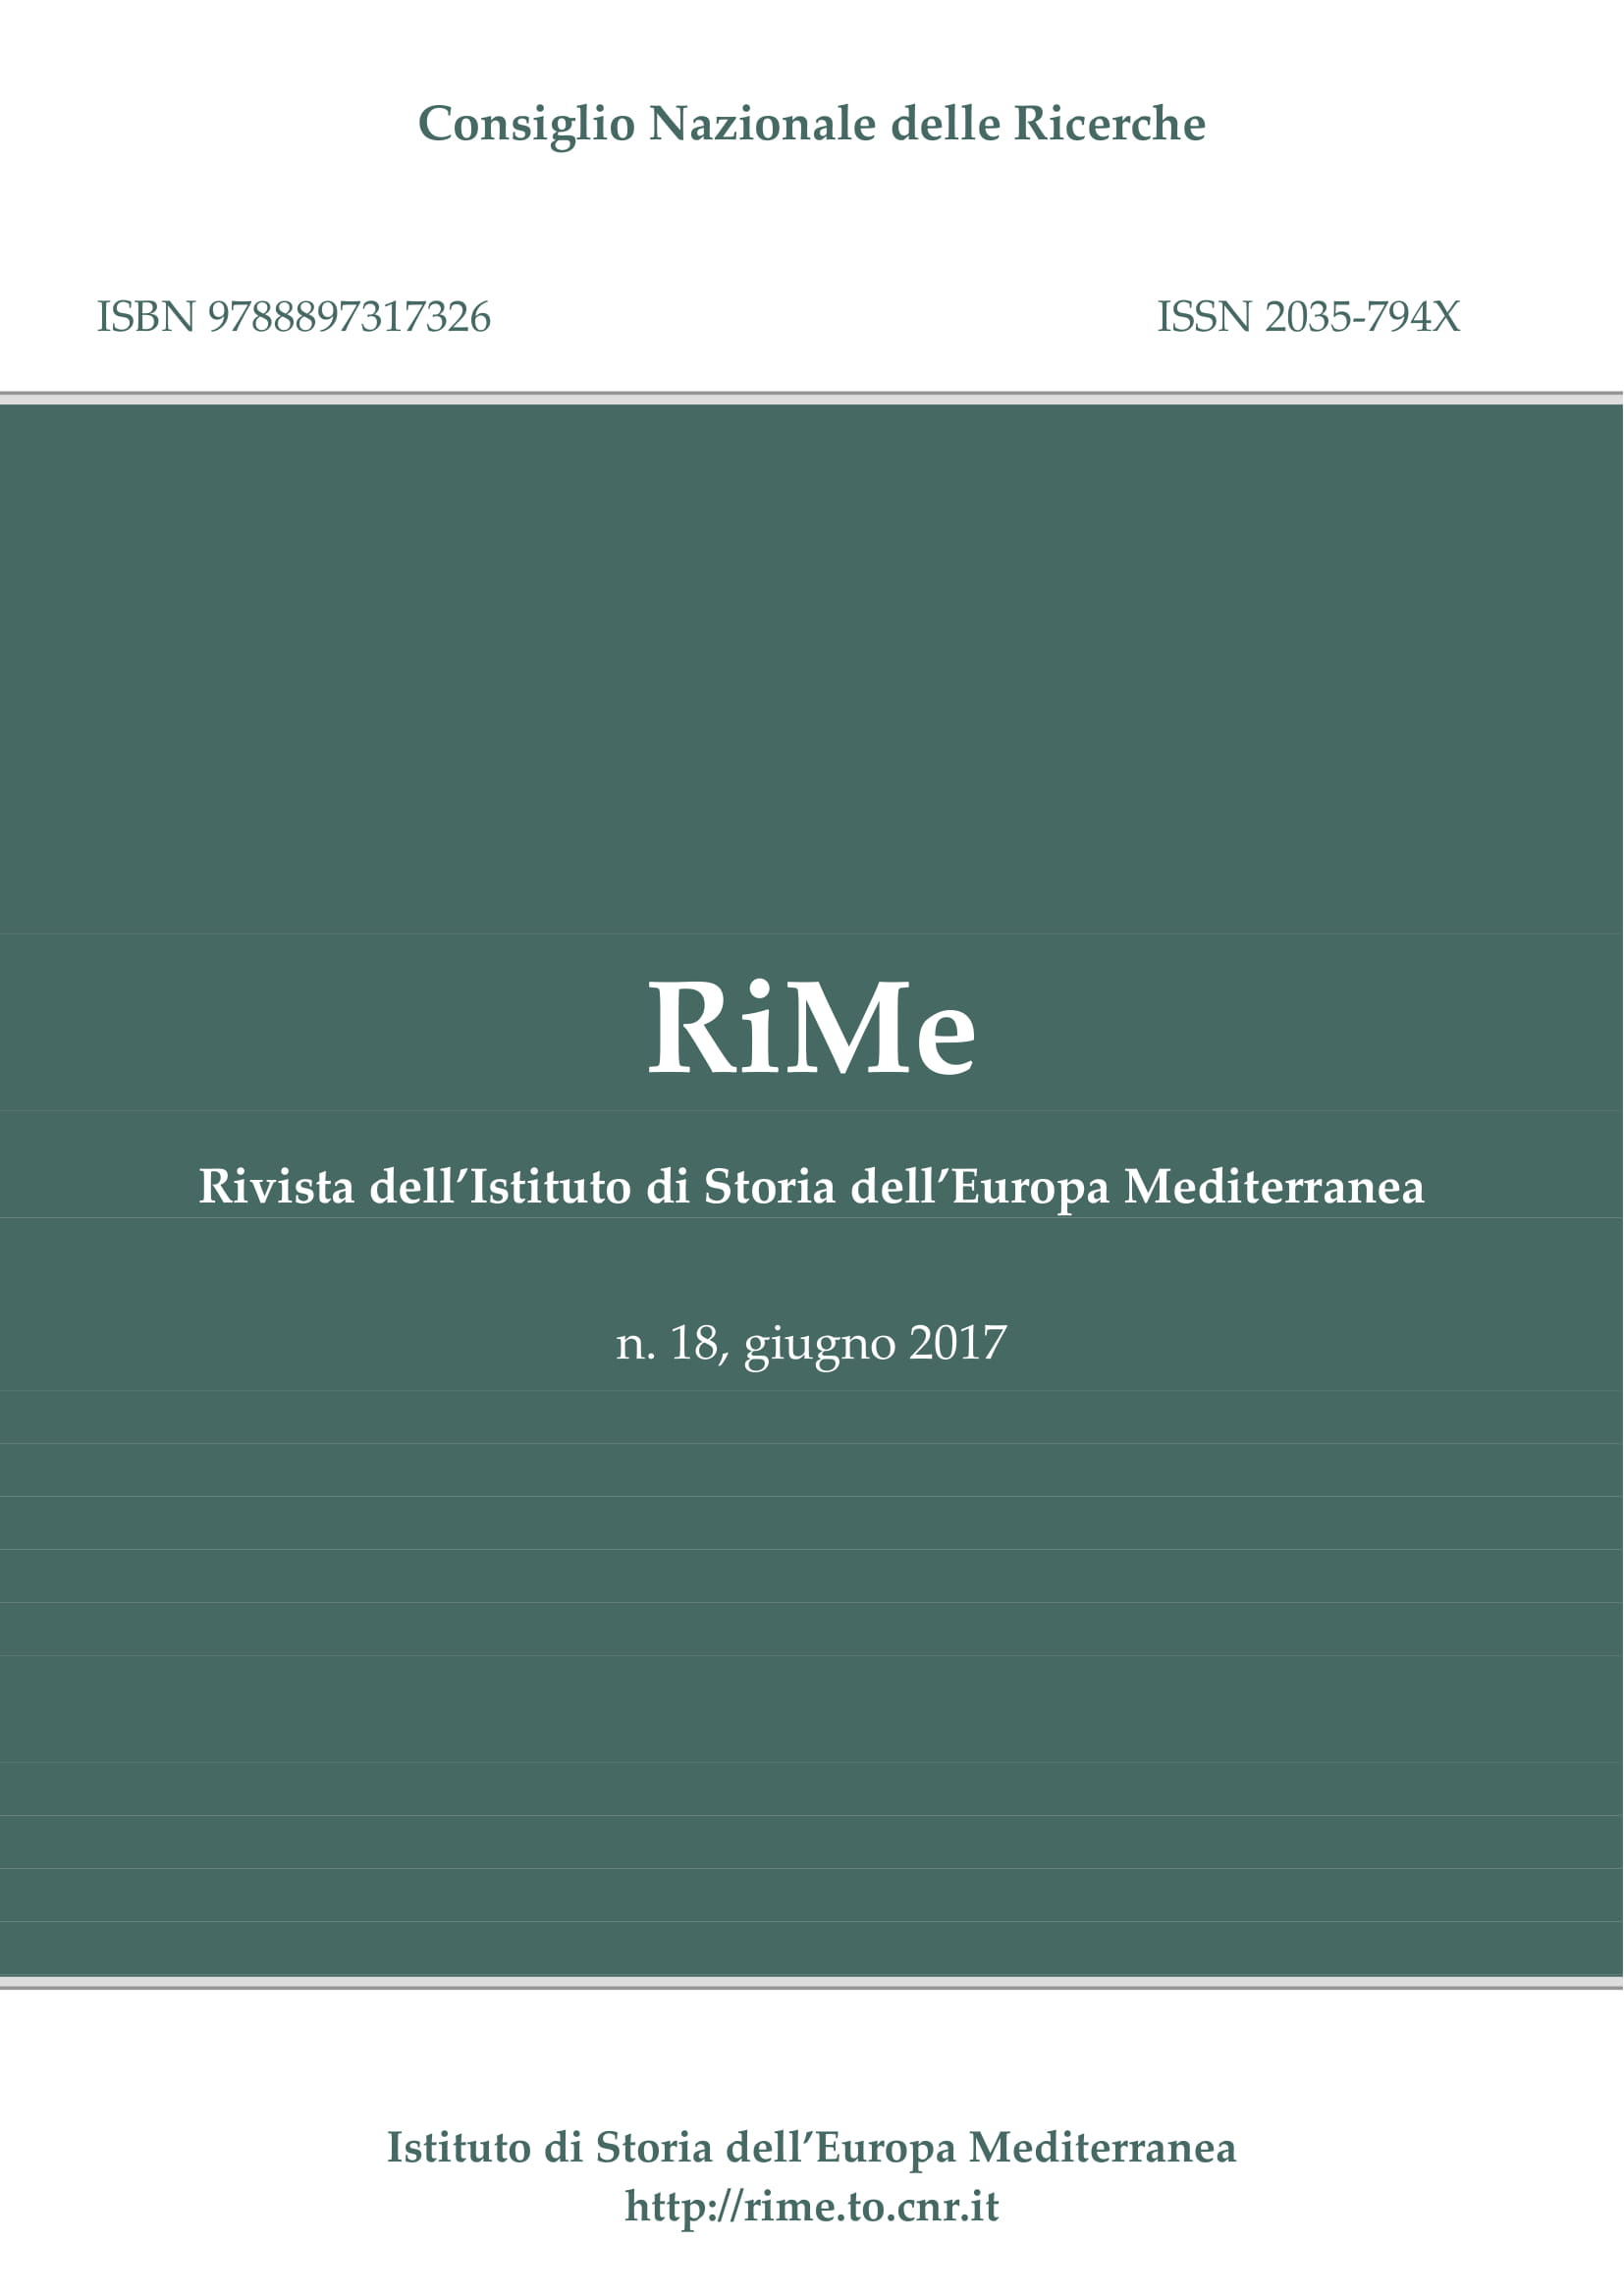 Vol. 18 (June 2017) cover